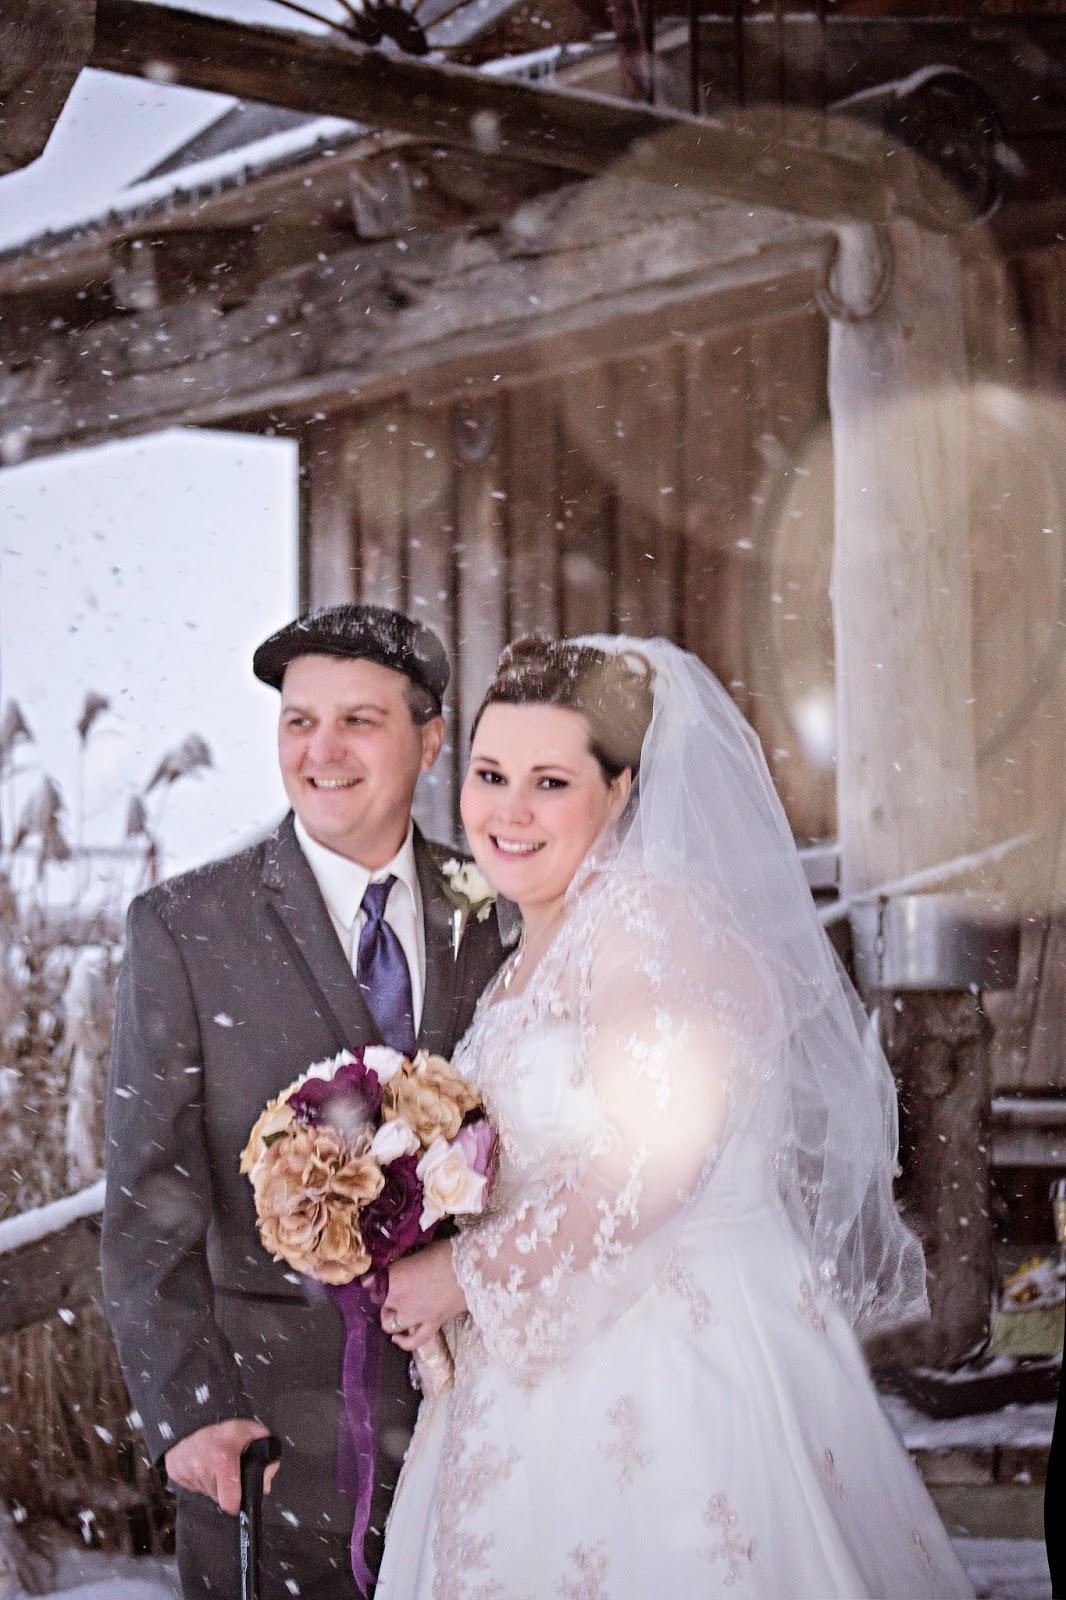 Winter wedding photography, winter wedding photos